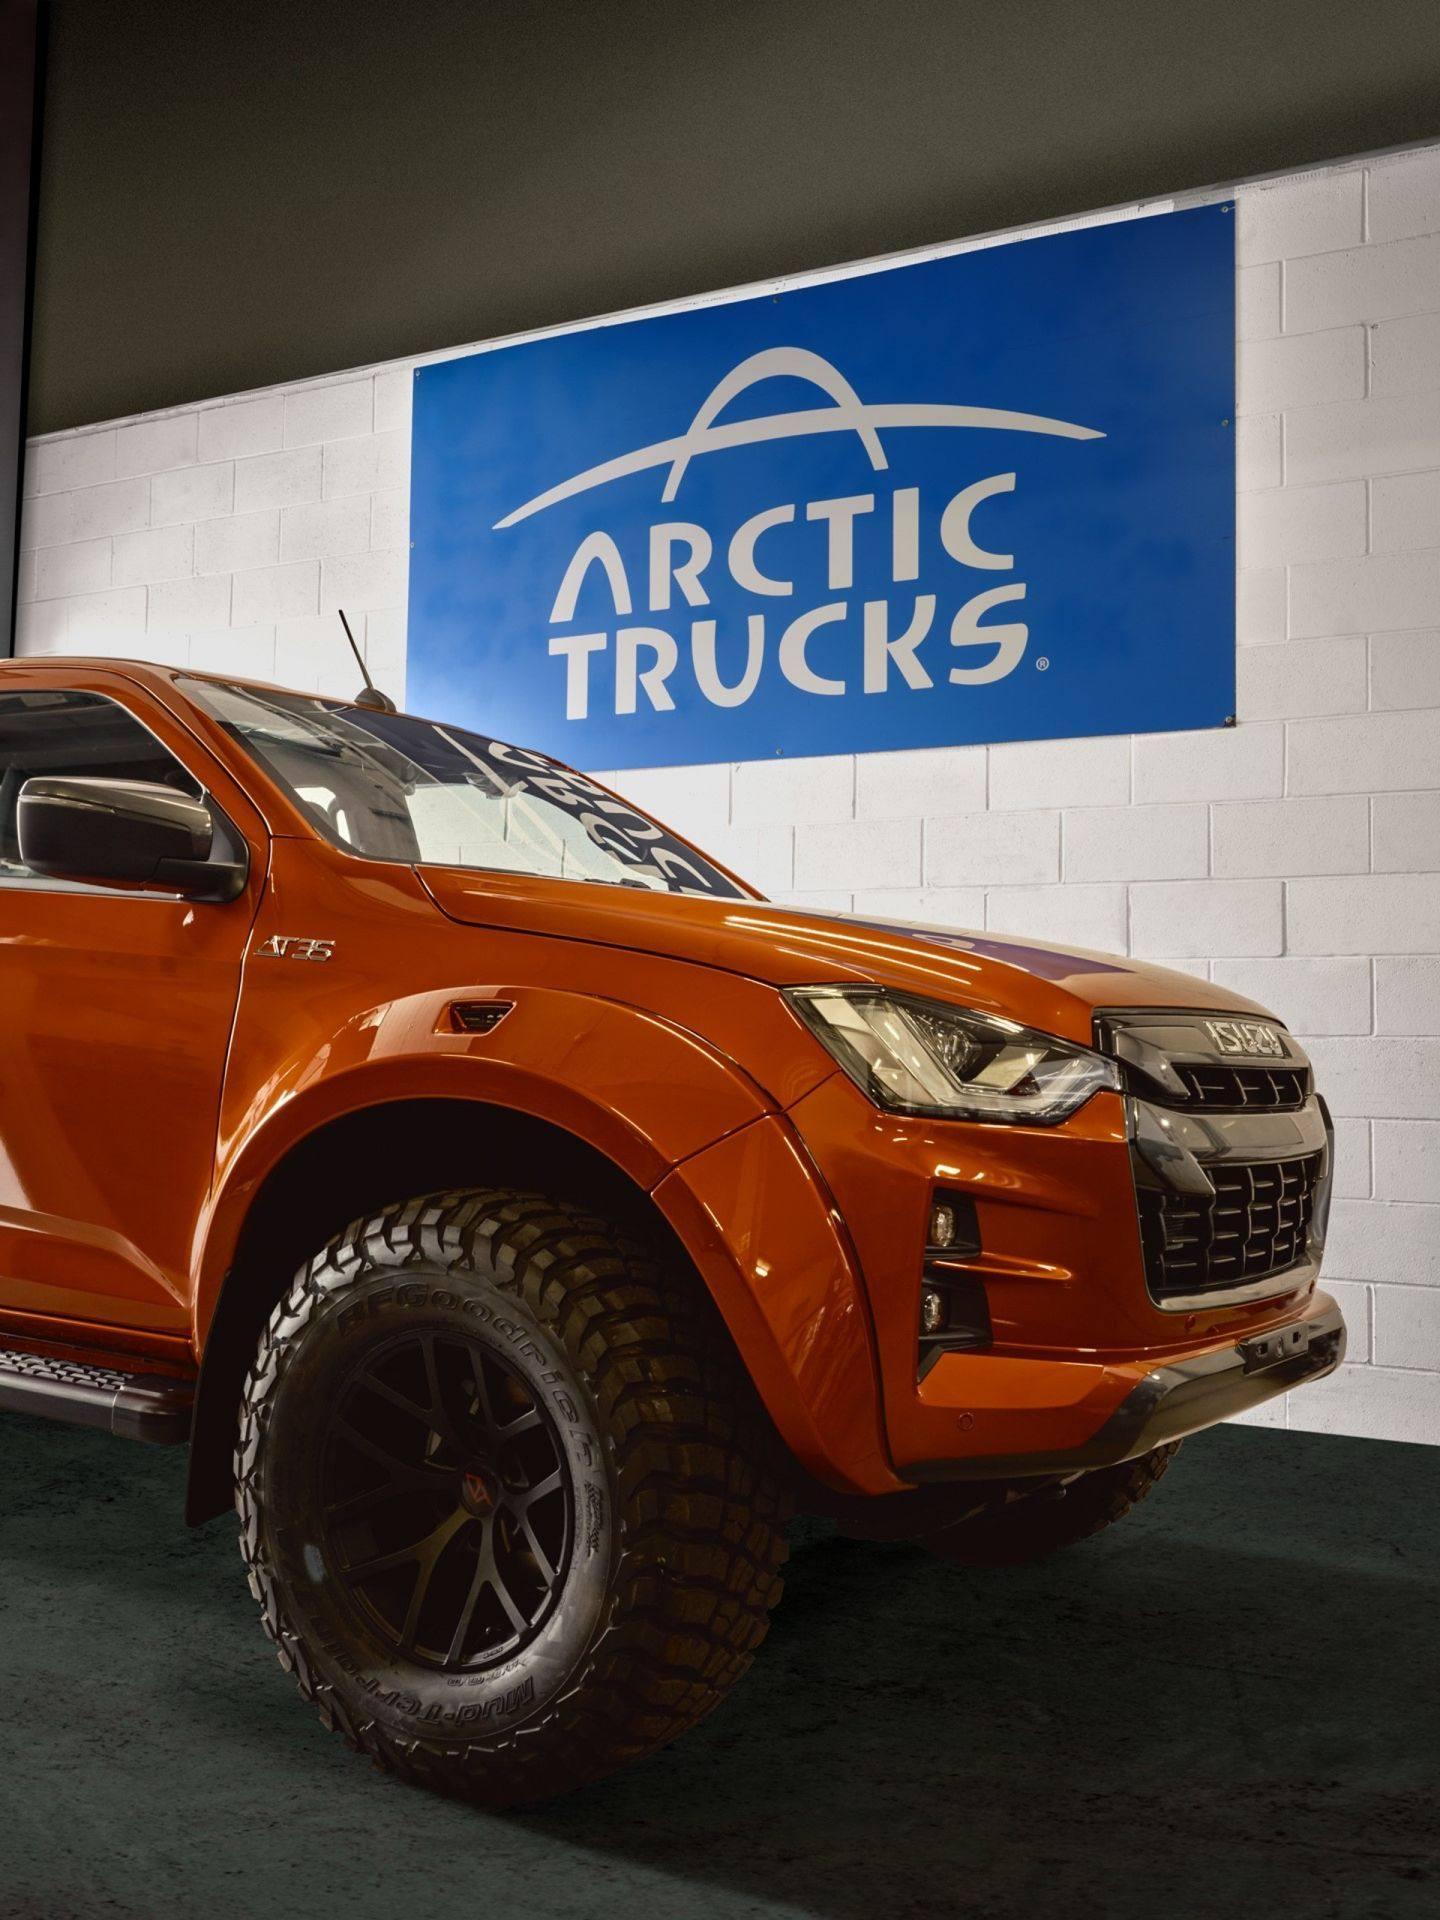 2022_Isuzu_D-Max_Arctic_Trucks_AT35-0008